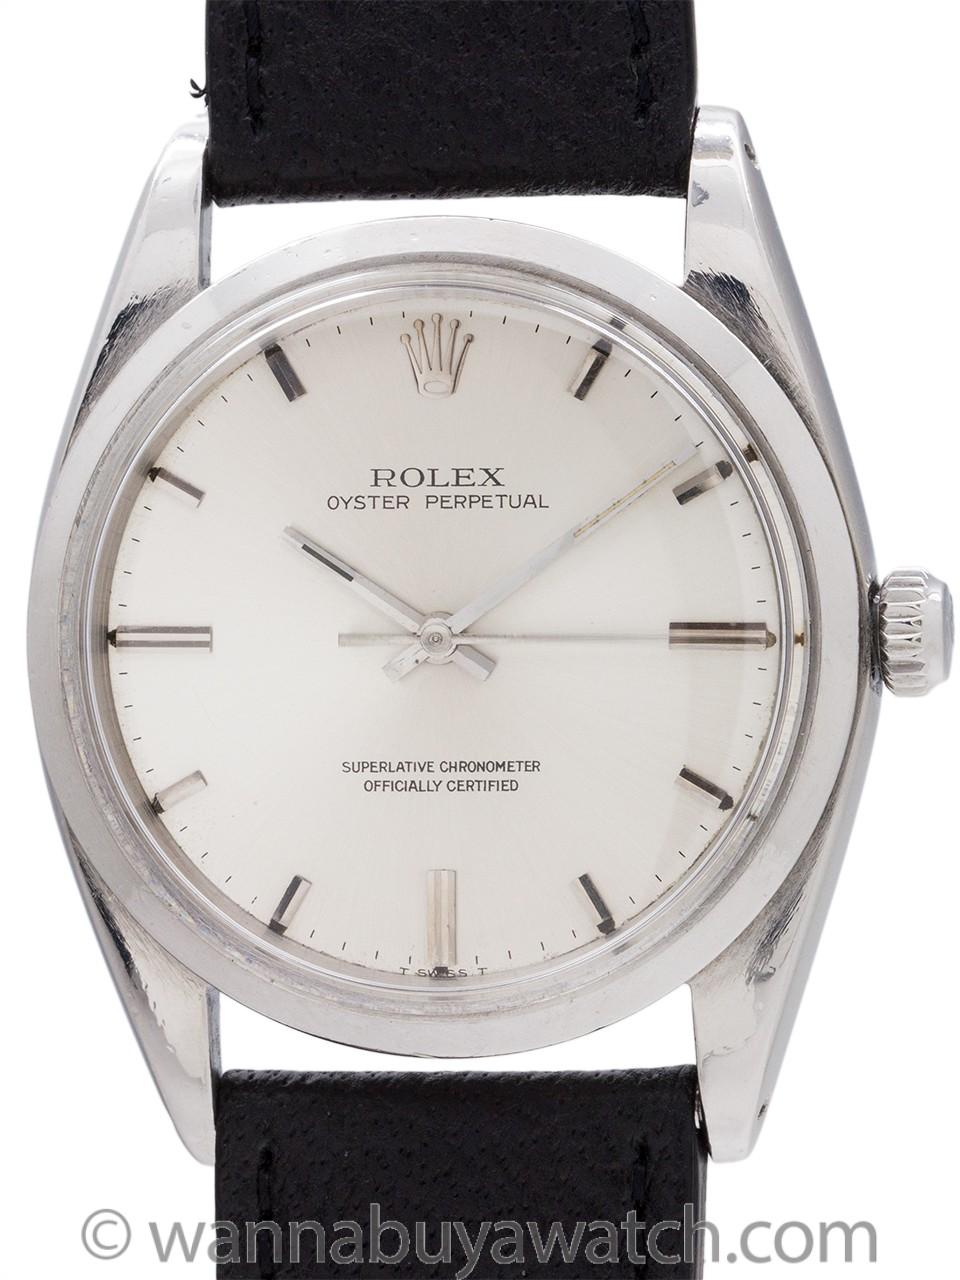 Rolex Oyster Perpetual ref# 1018 circa 1967 Chronometer Certificate